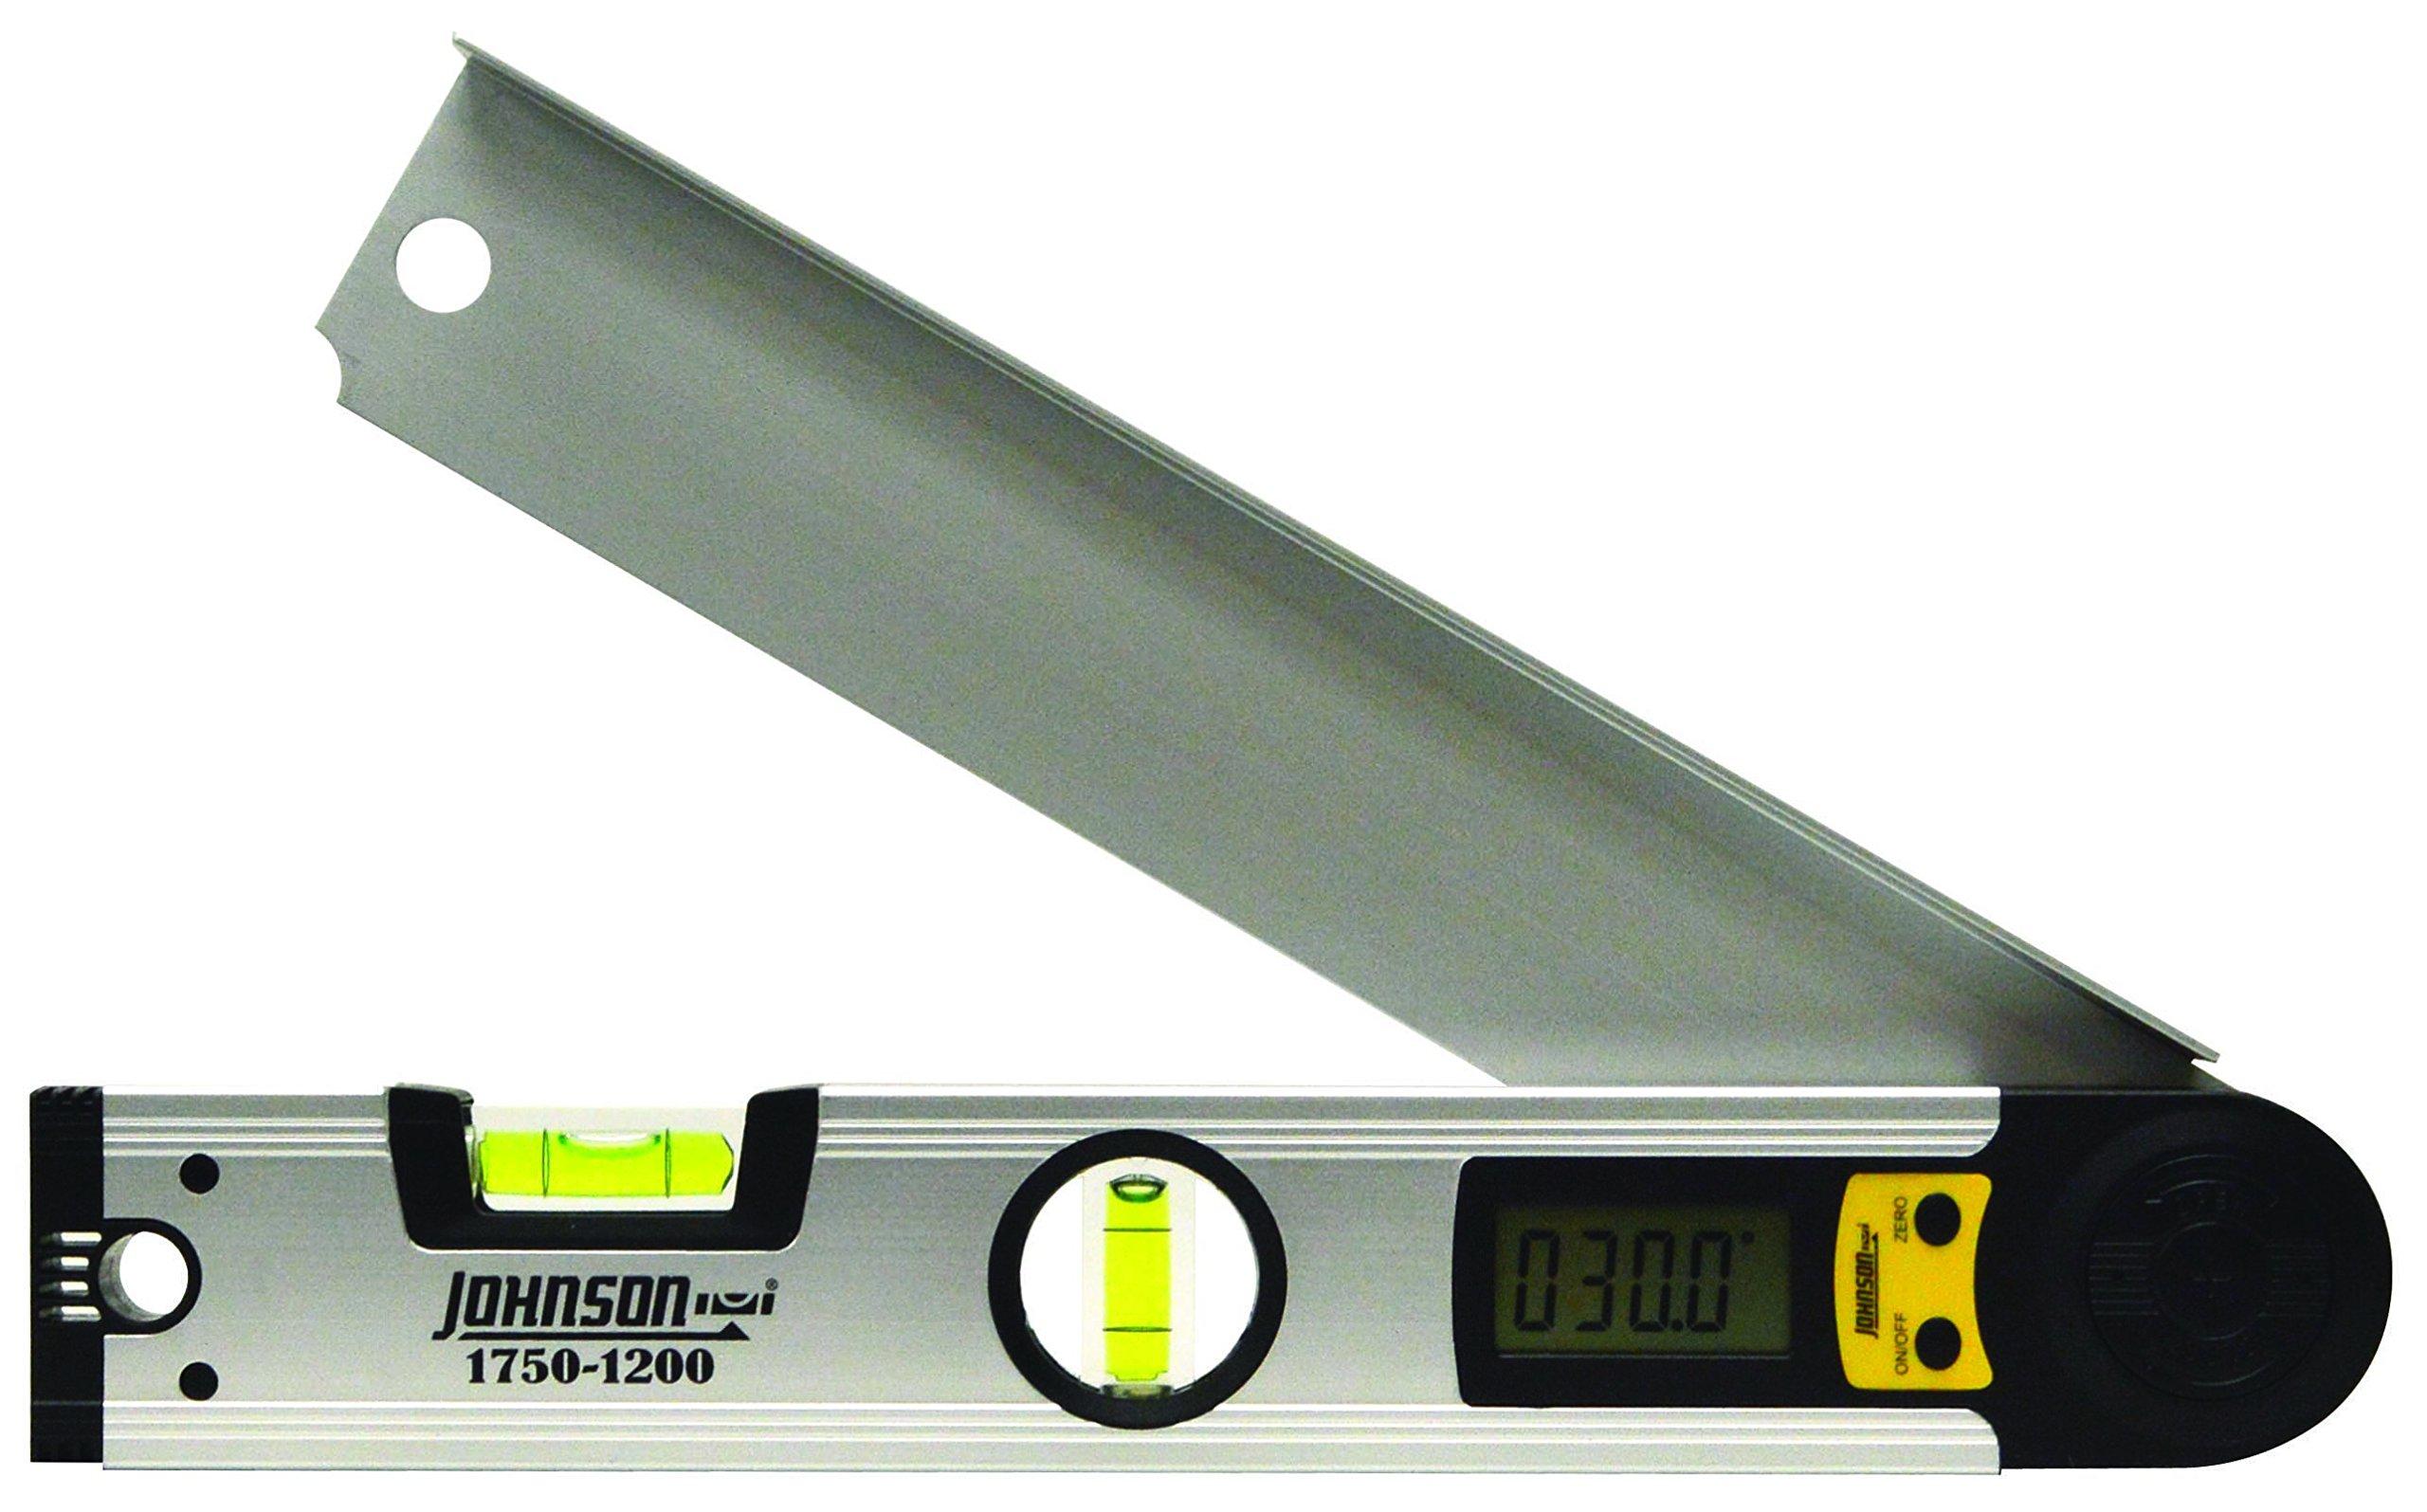 Johnson Level & Tool 1750-1200 Digital Angle Locator, 12-Inch